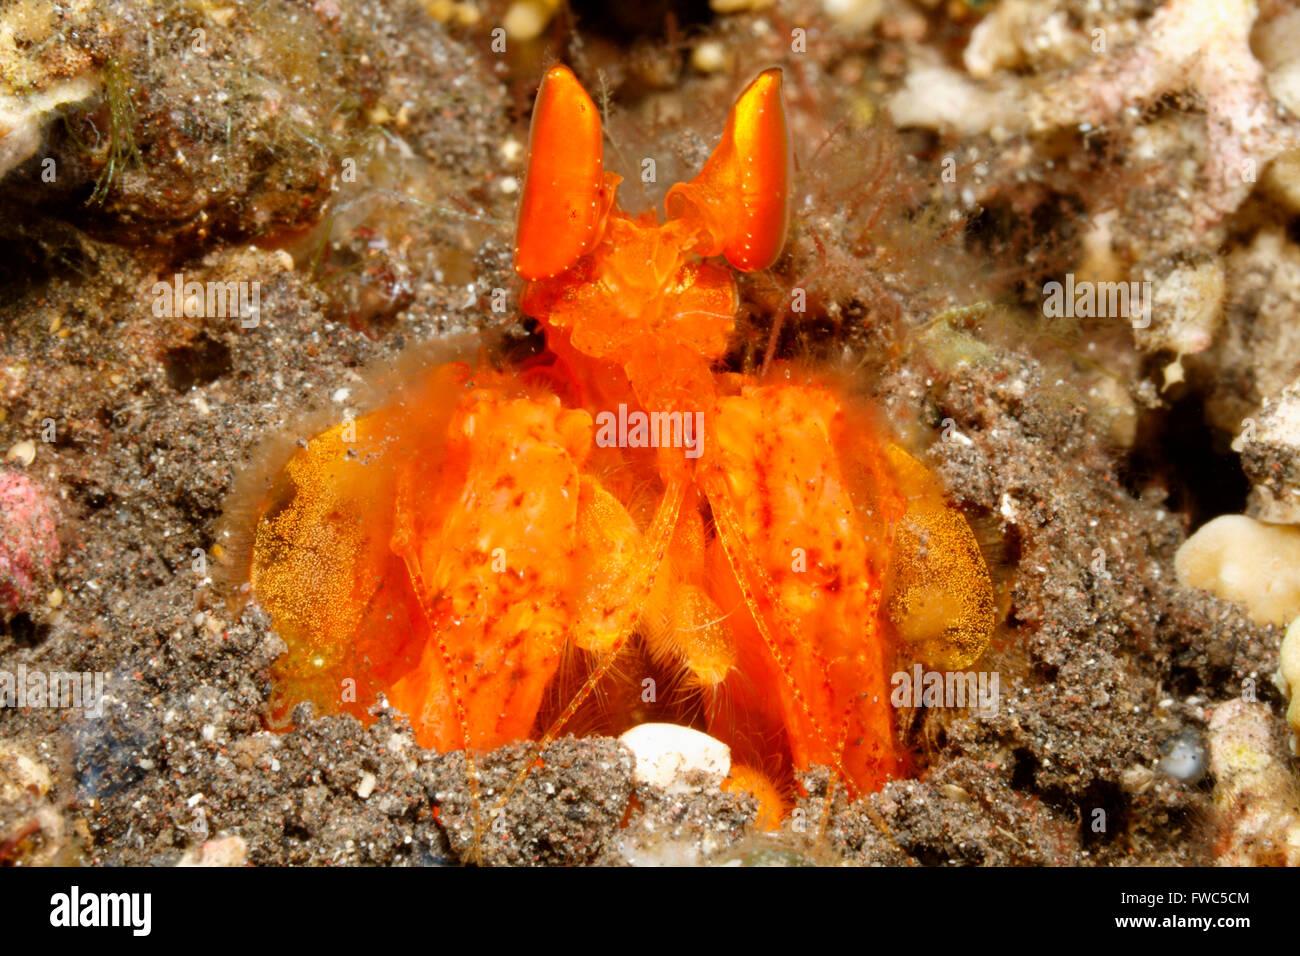 orange-mantis-shrimp-also-known-as-golden-mantis-shrimp-lysiosquilloides-FWC5CM.jpg